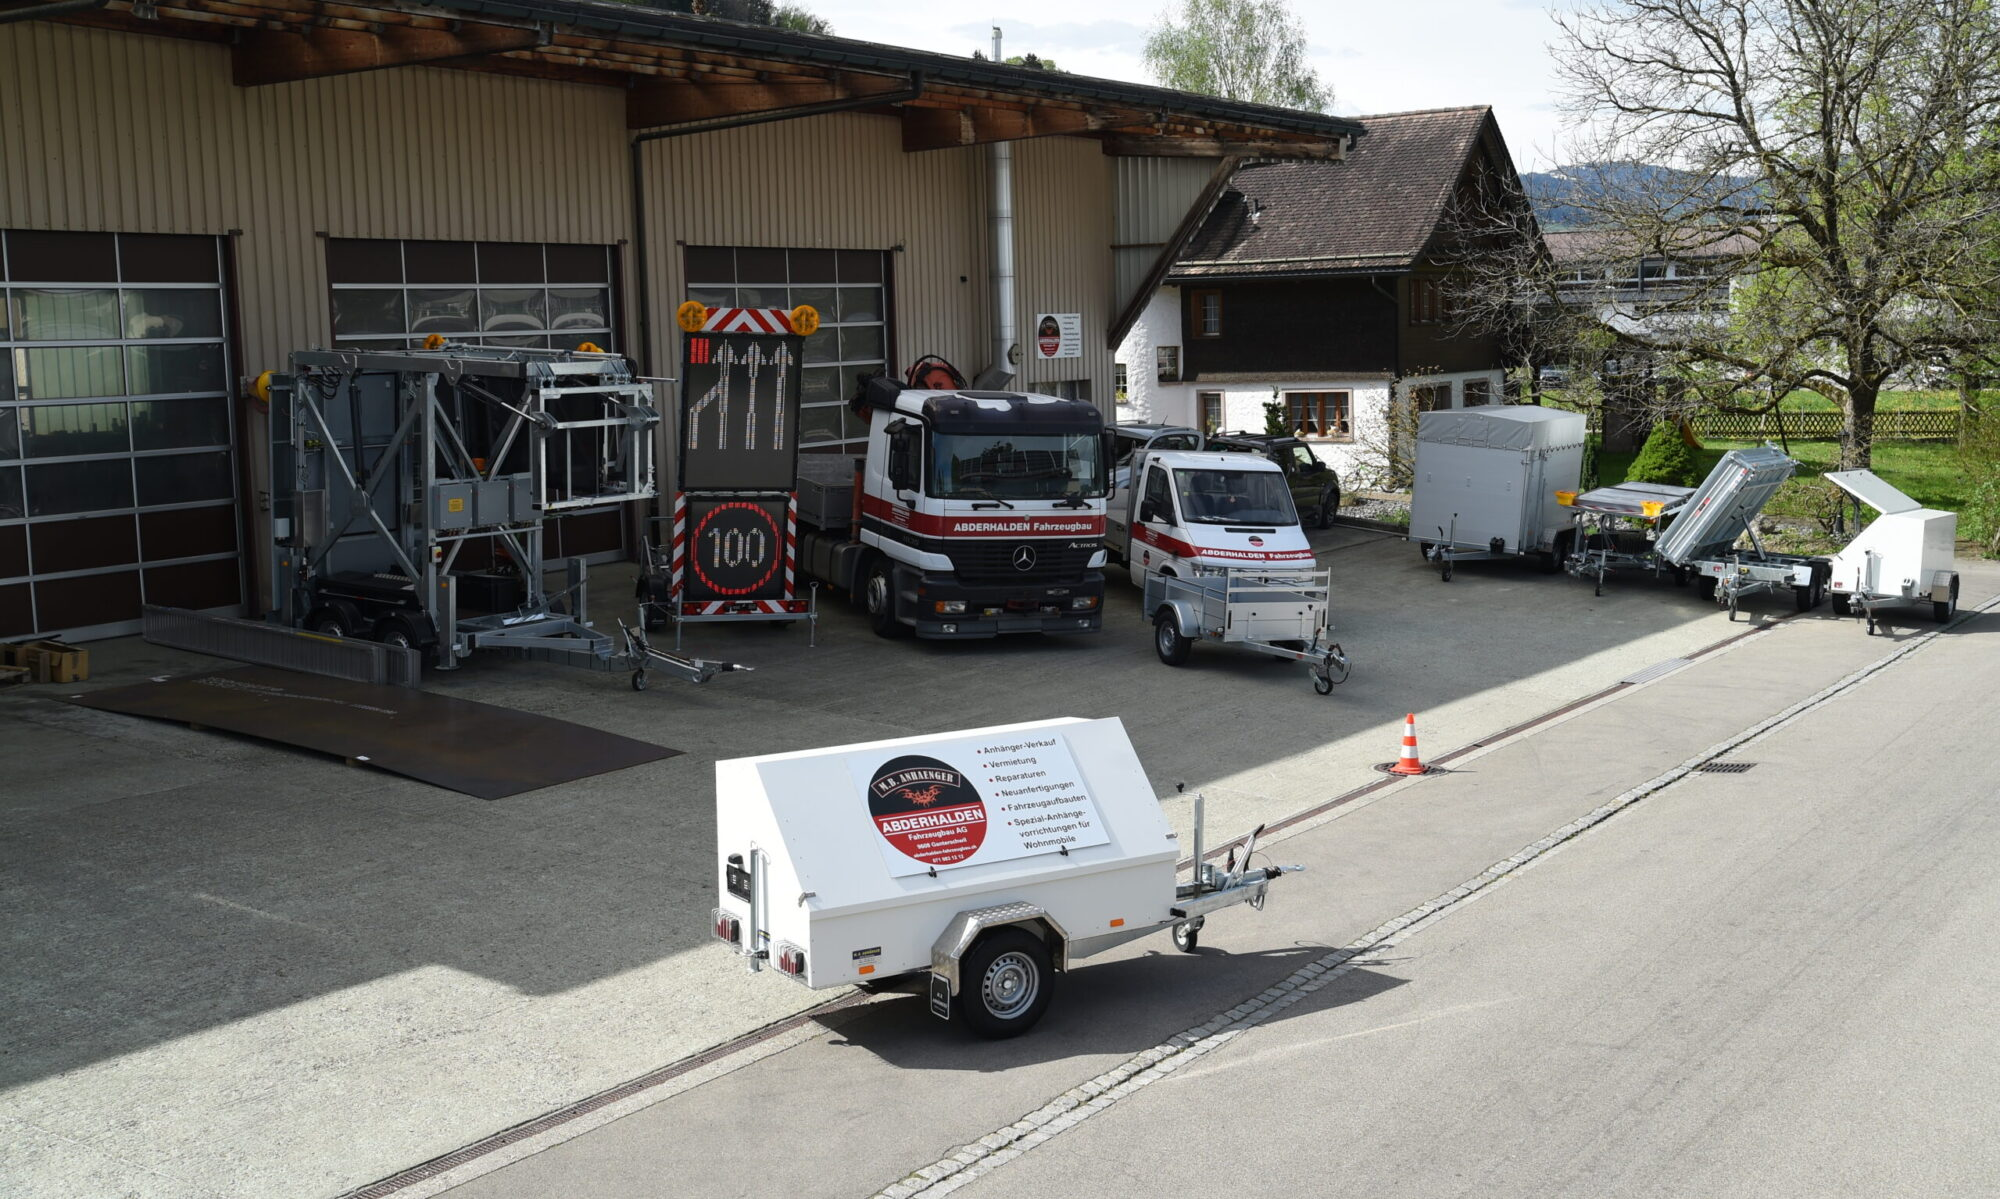 Abderhalden Fahrzeugbau AG